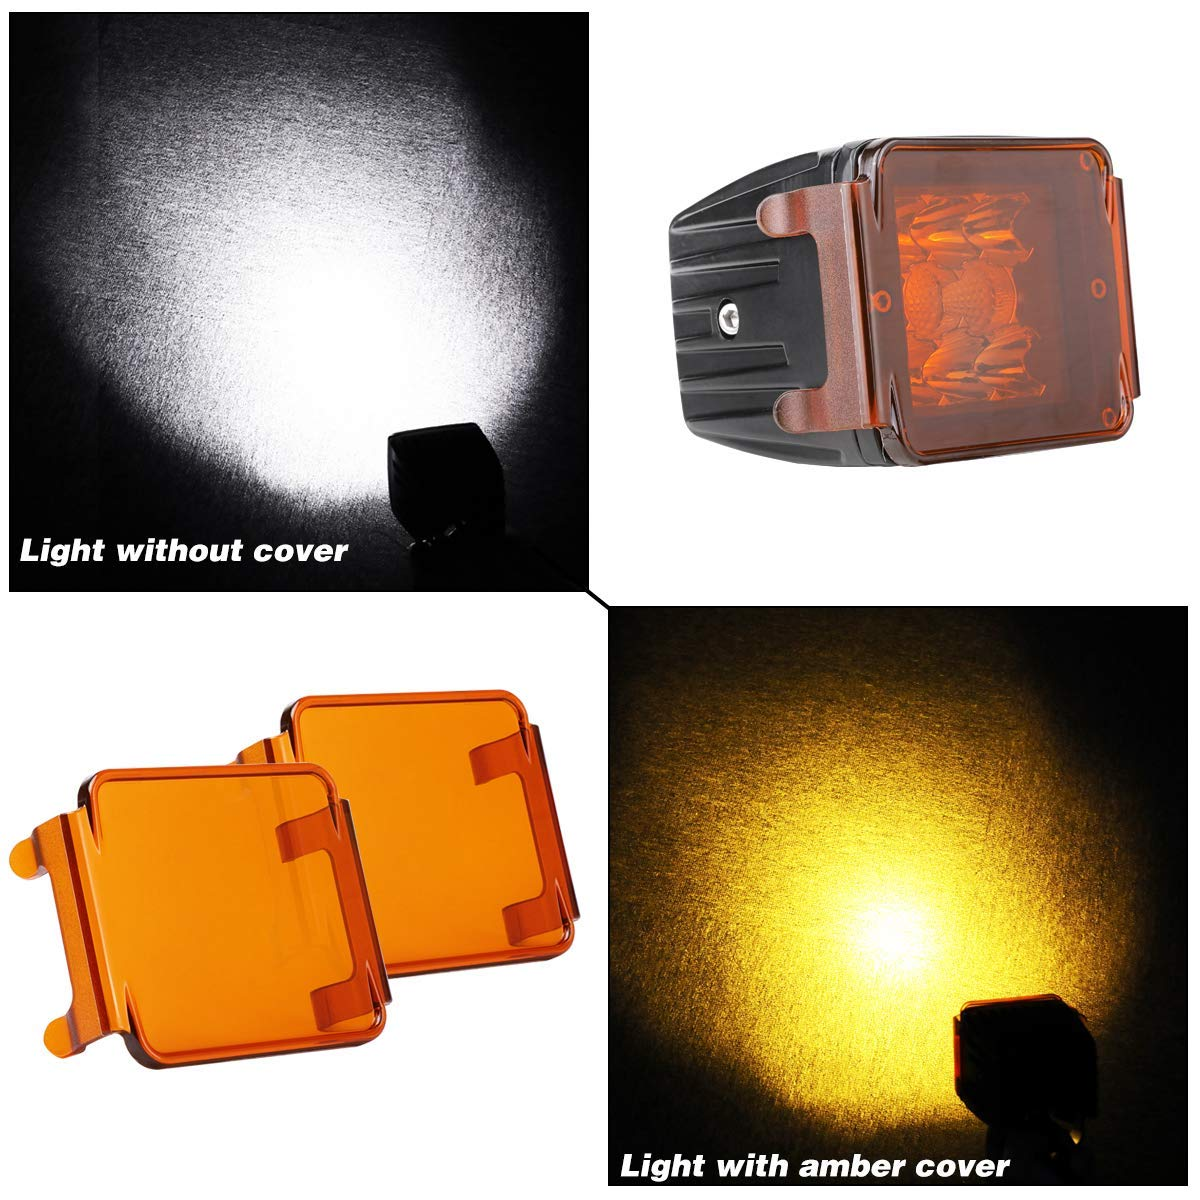 Work Lights Driving Lights Fog Lights Black LED Cube Light Covers Nirider 2PCS 3 Inch Light Bar Covers for Square LED Pods Off Road Lights